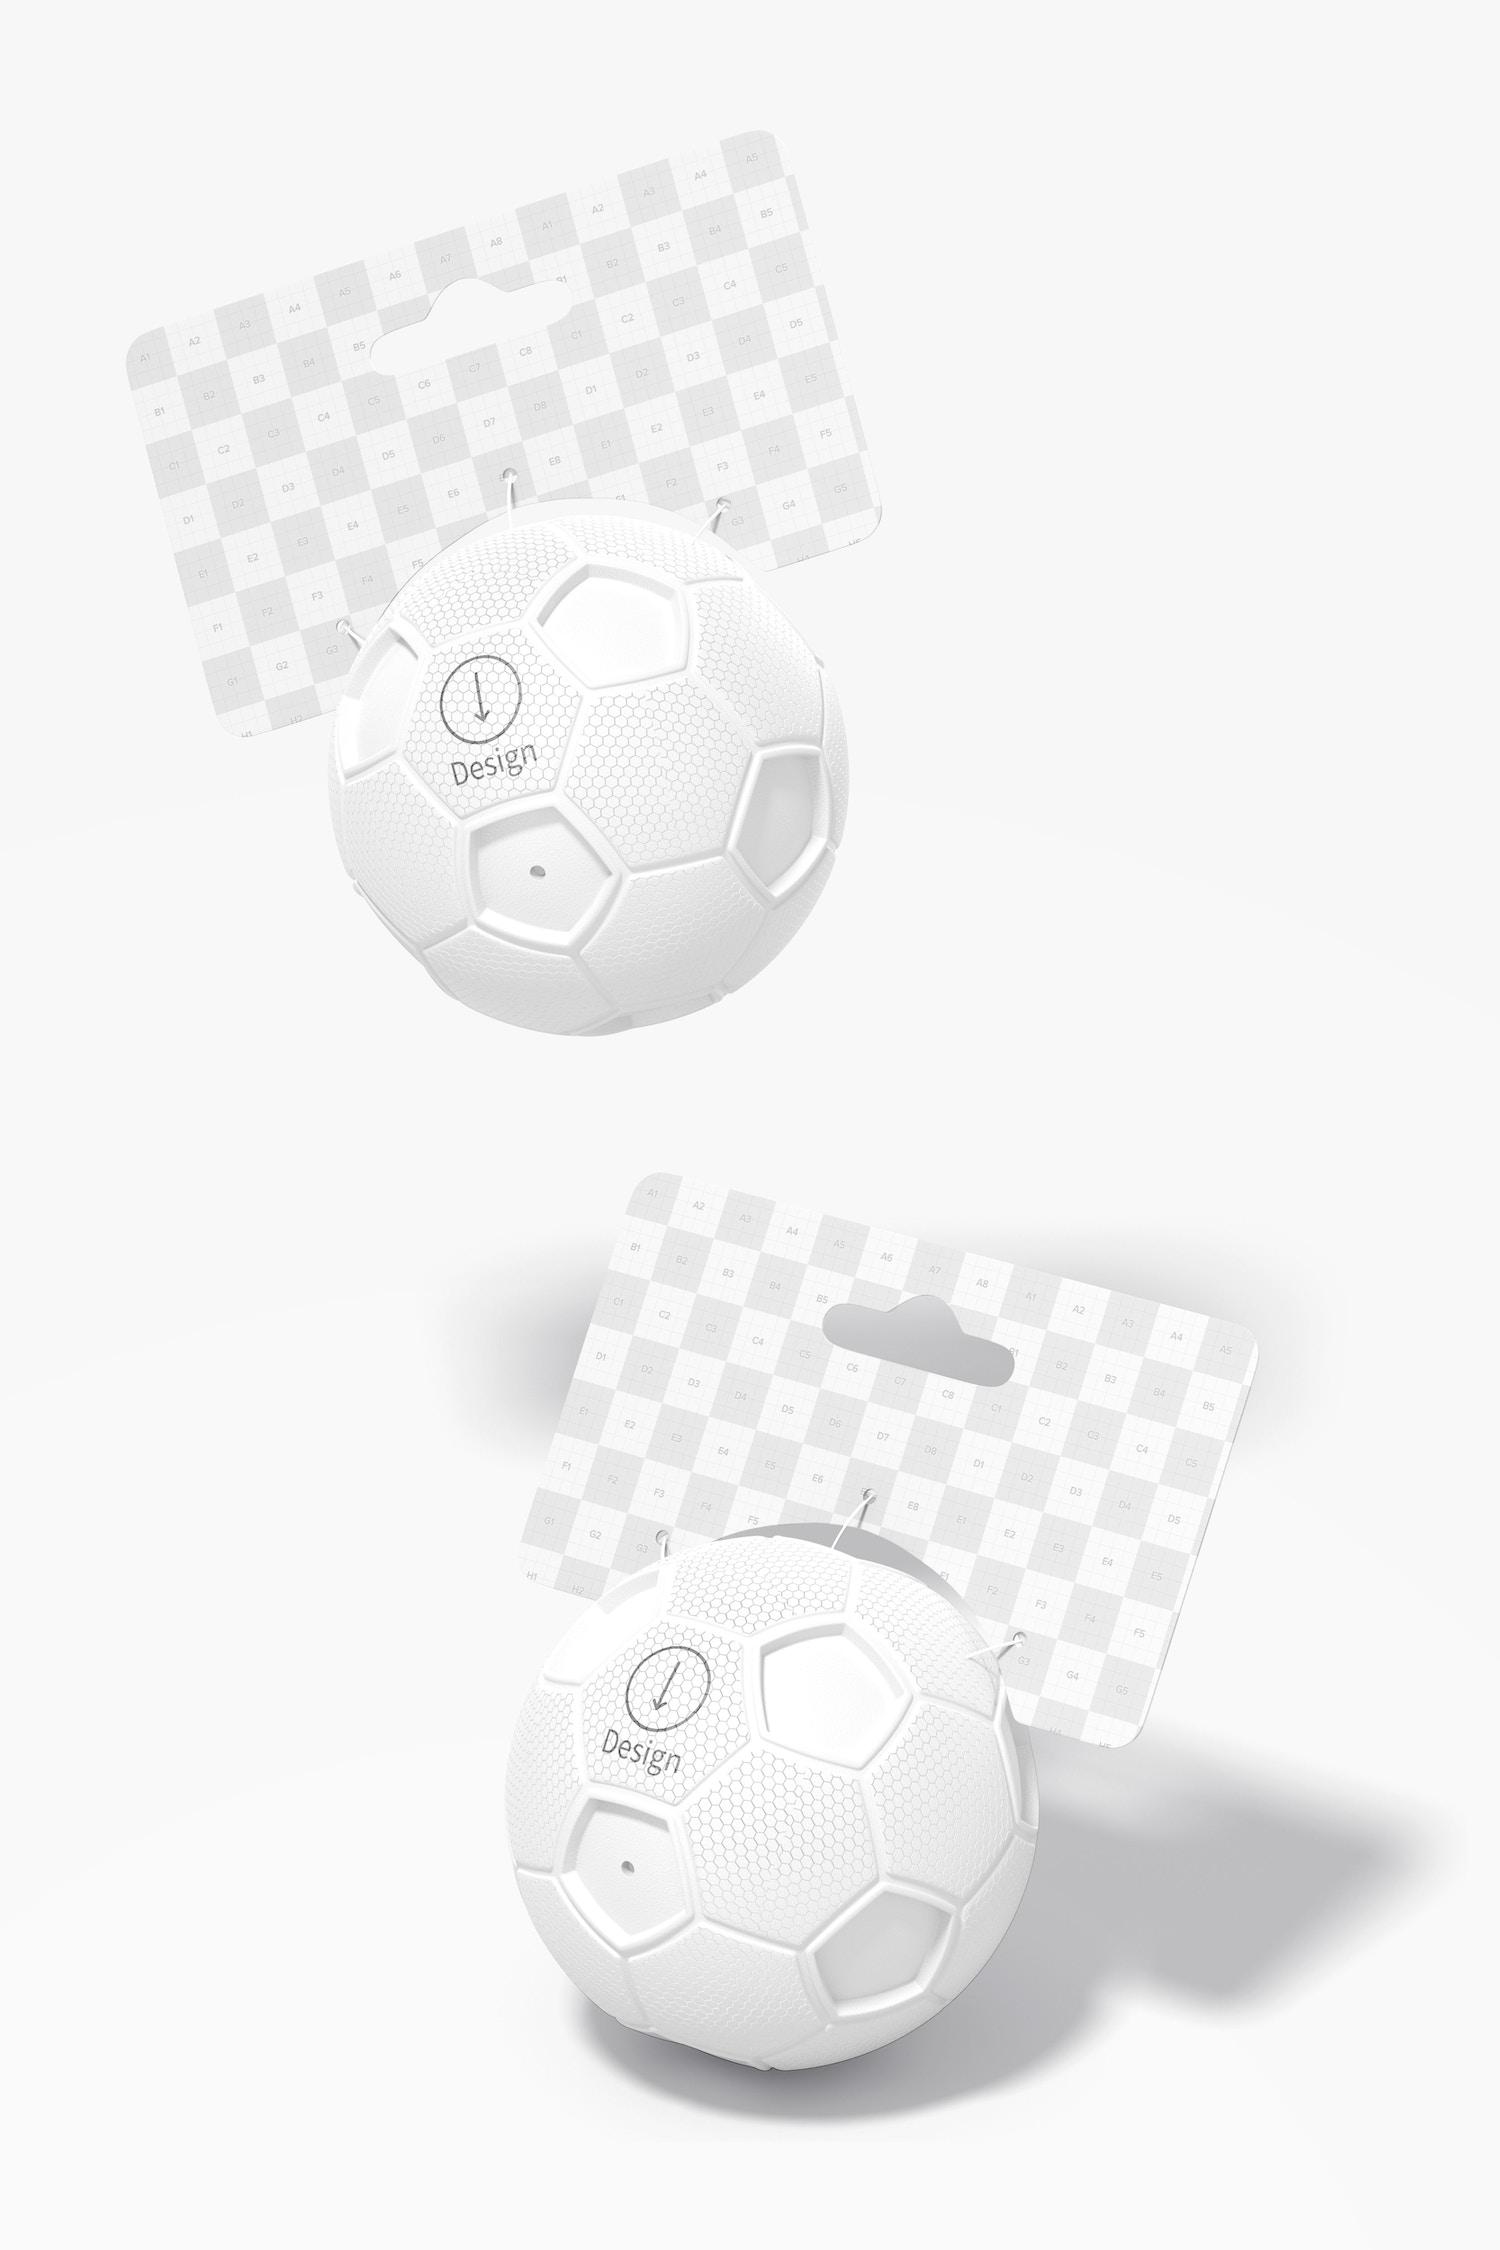 Soccer Squeak Balls Mockup, Falling